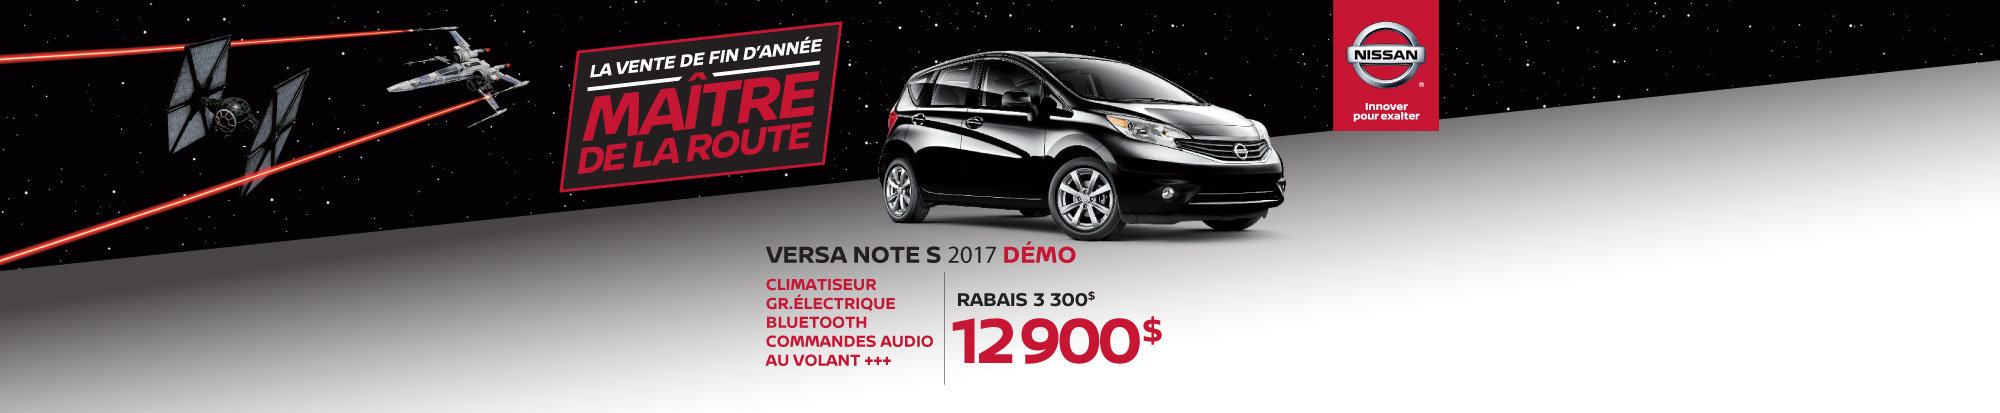 Nissan Versa Note St-Hy web